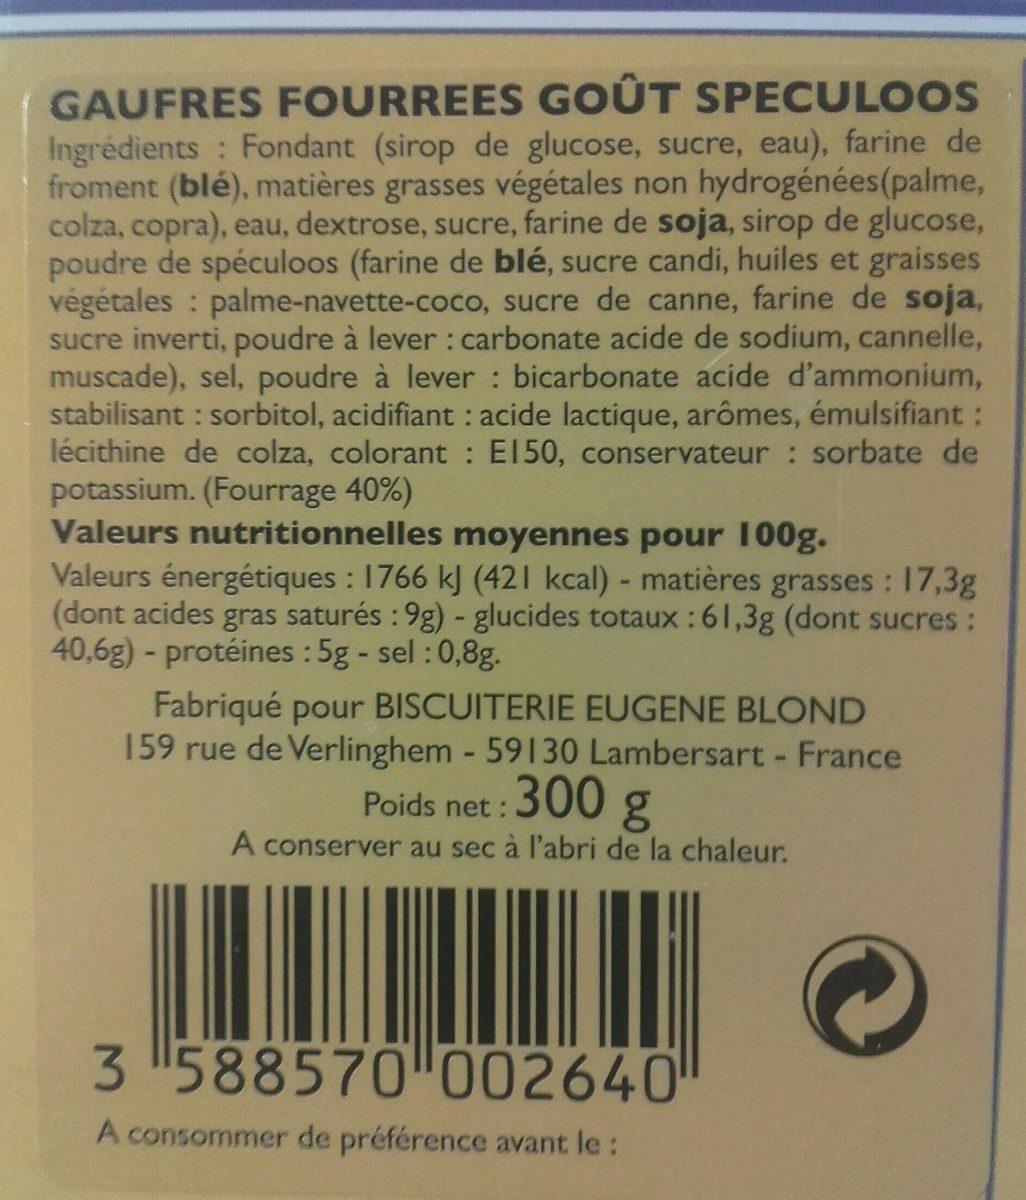 Gaufres Fourrées au Speculoos - Product